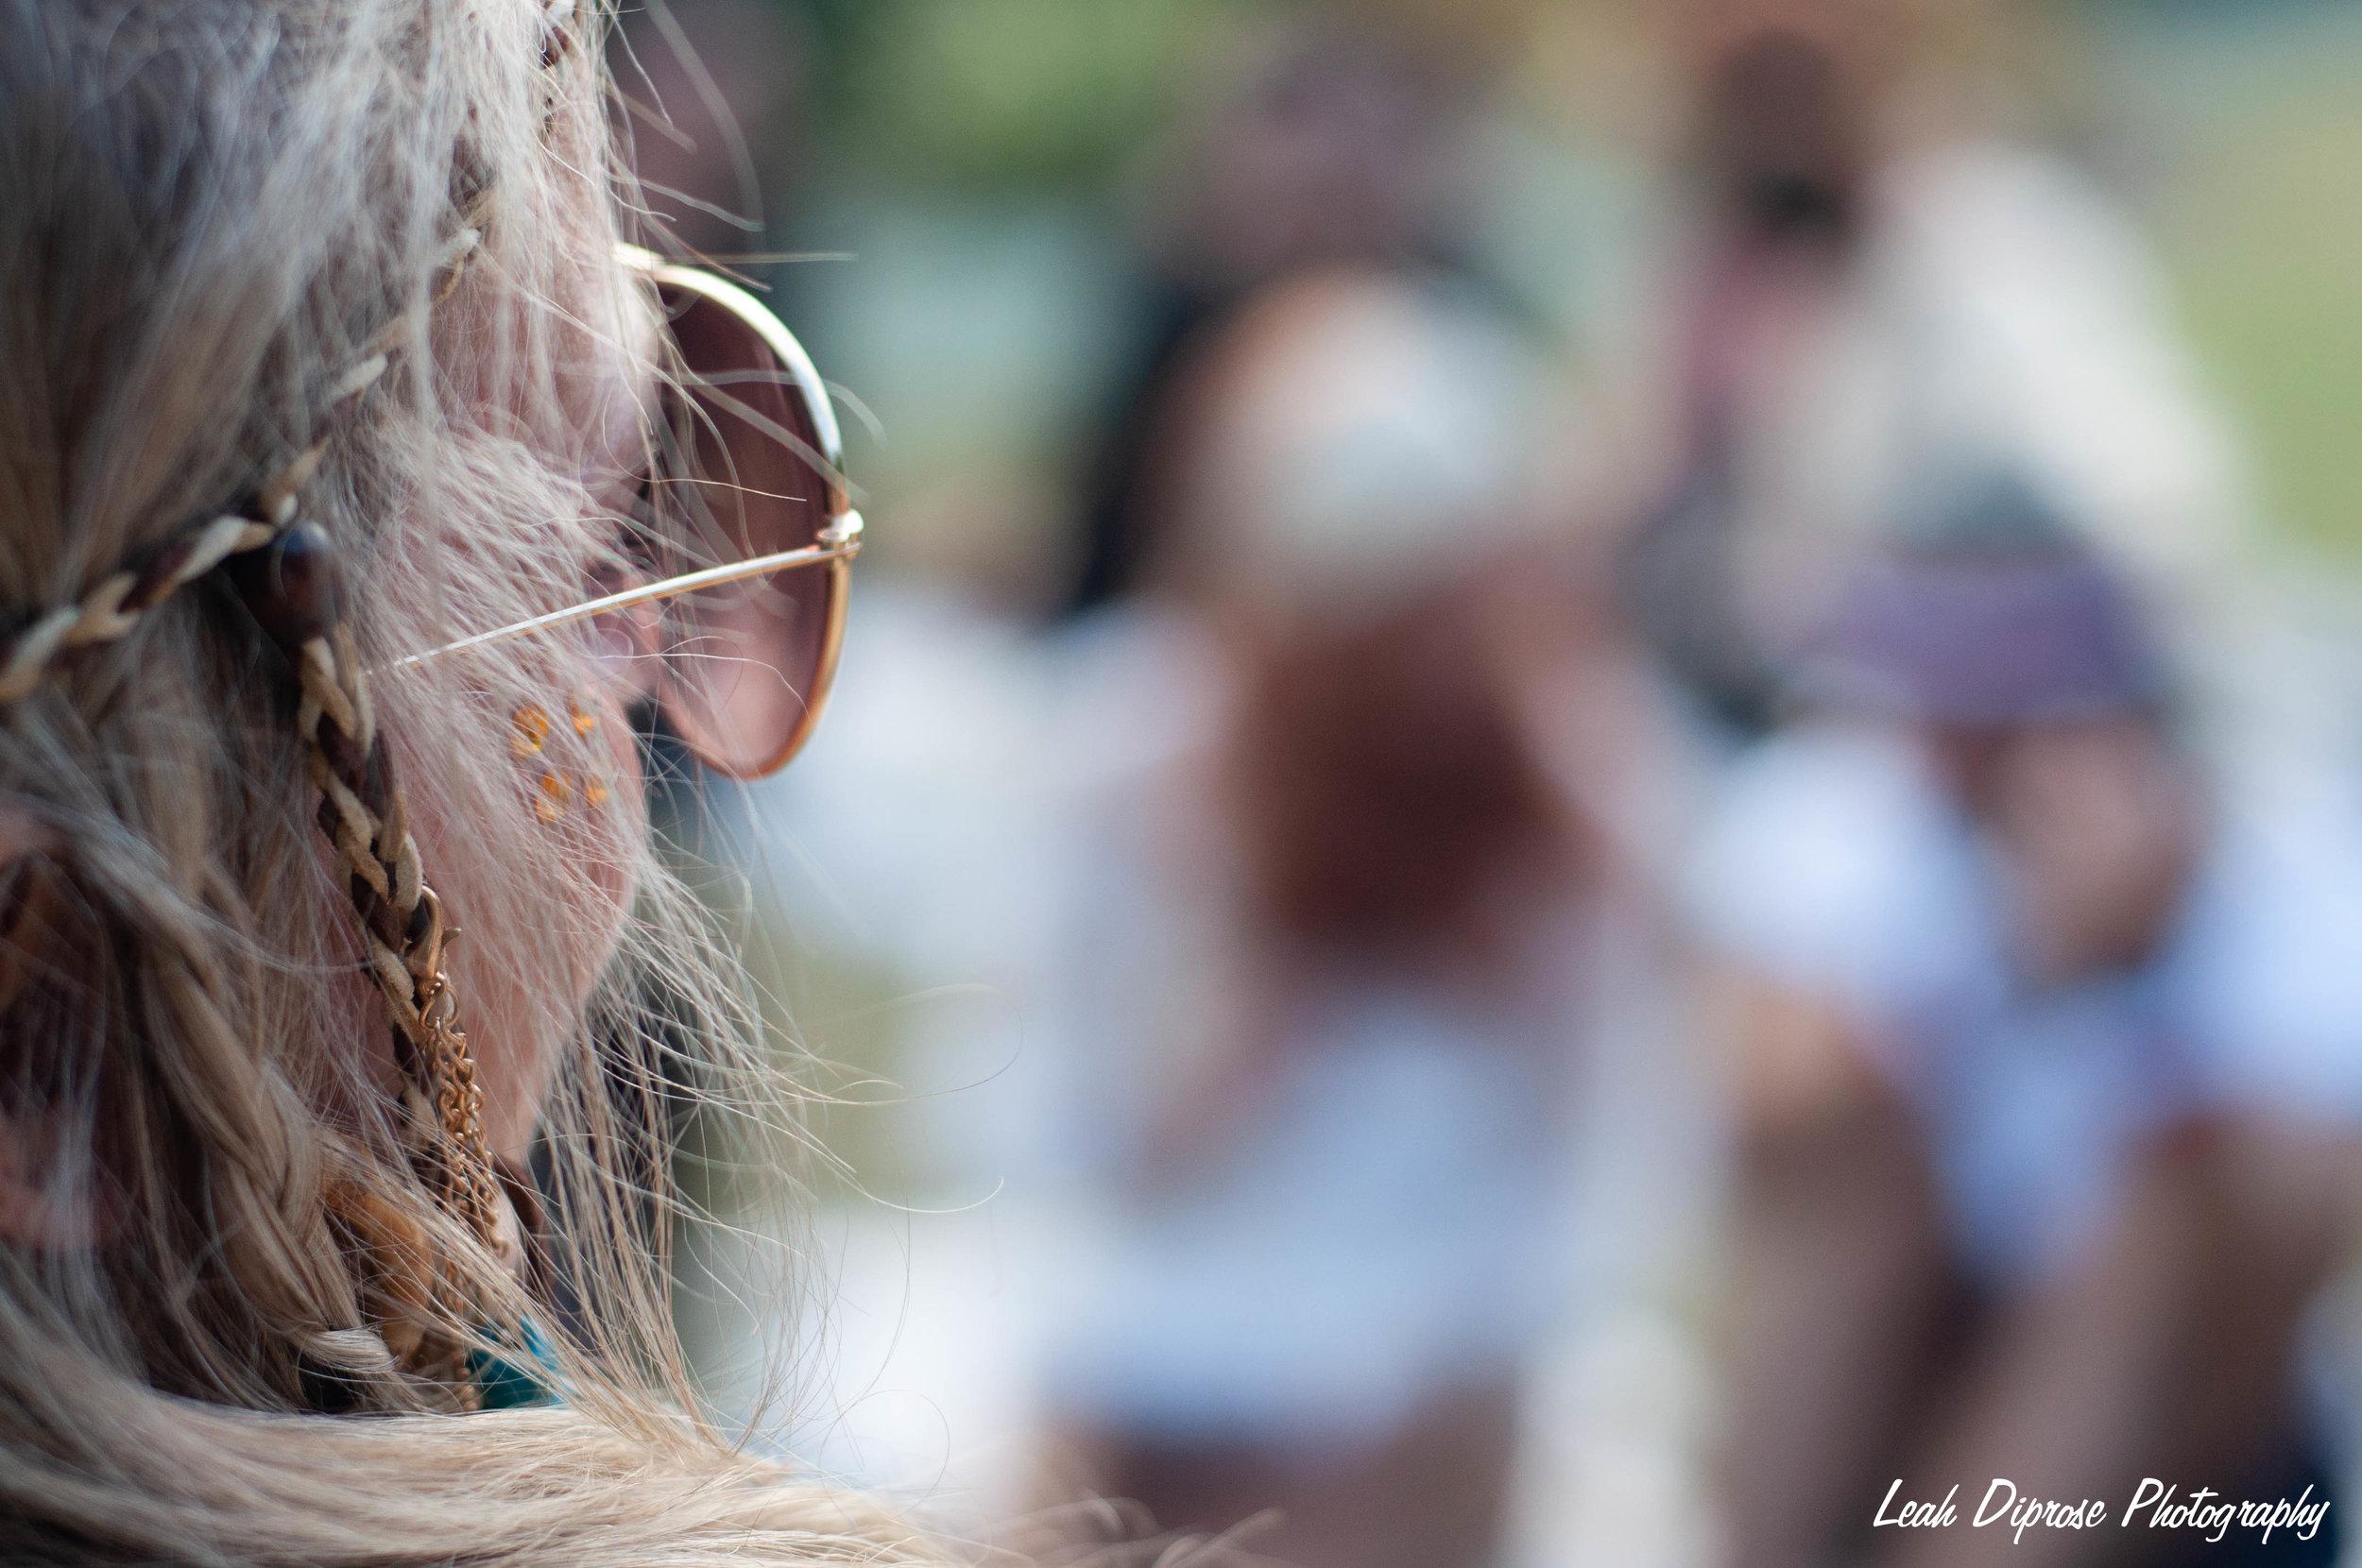 Leah Diprose Photography image-9932.jpg